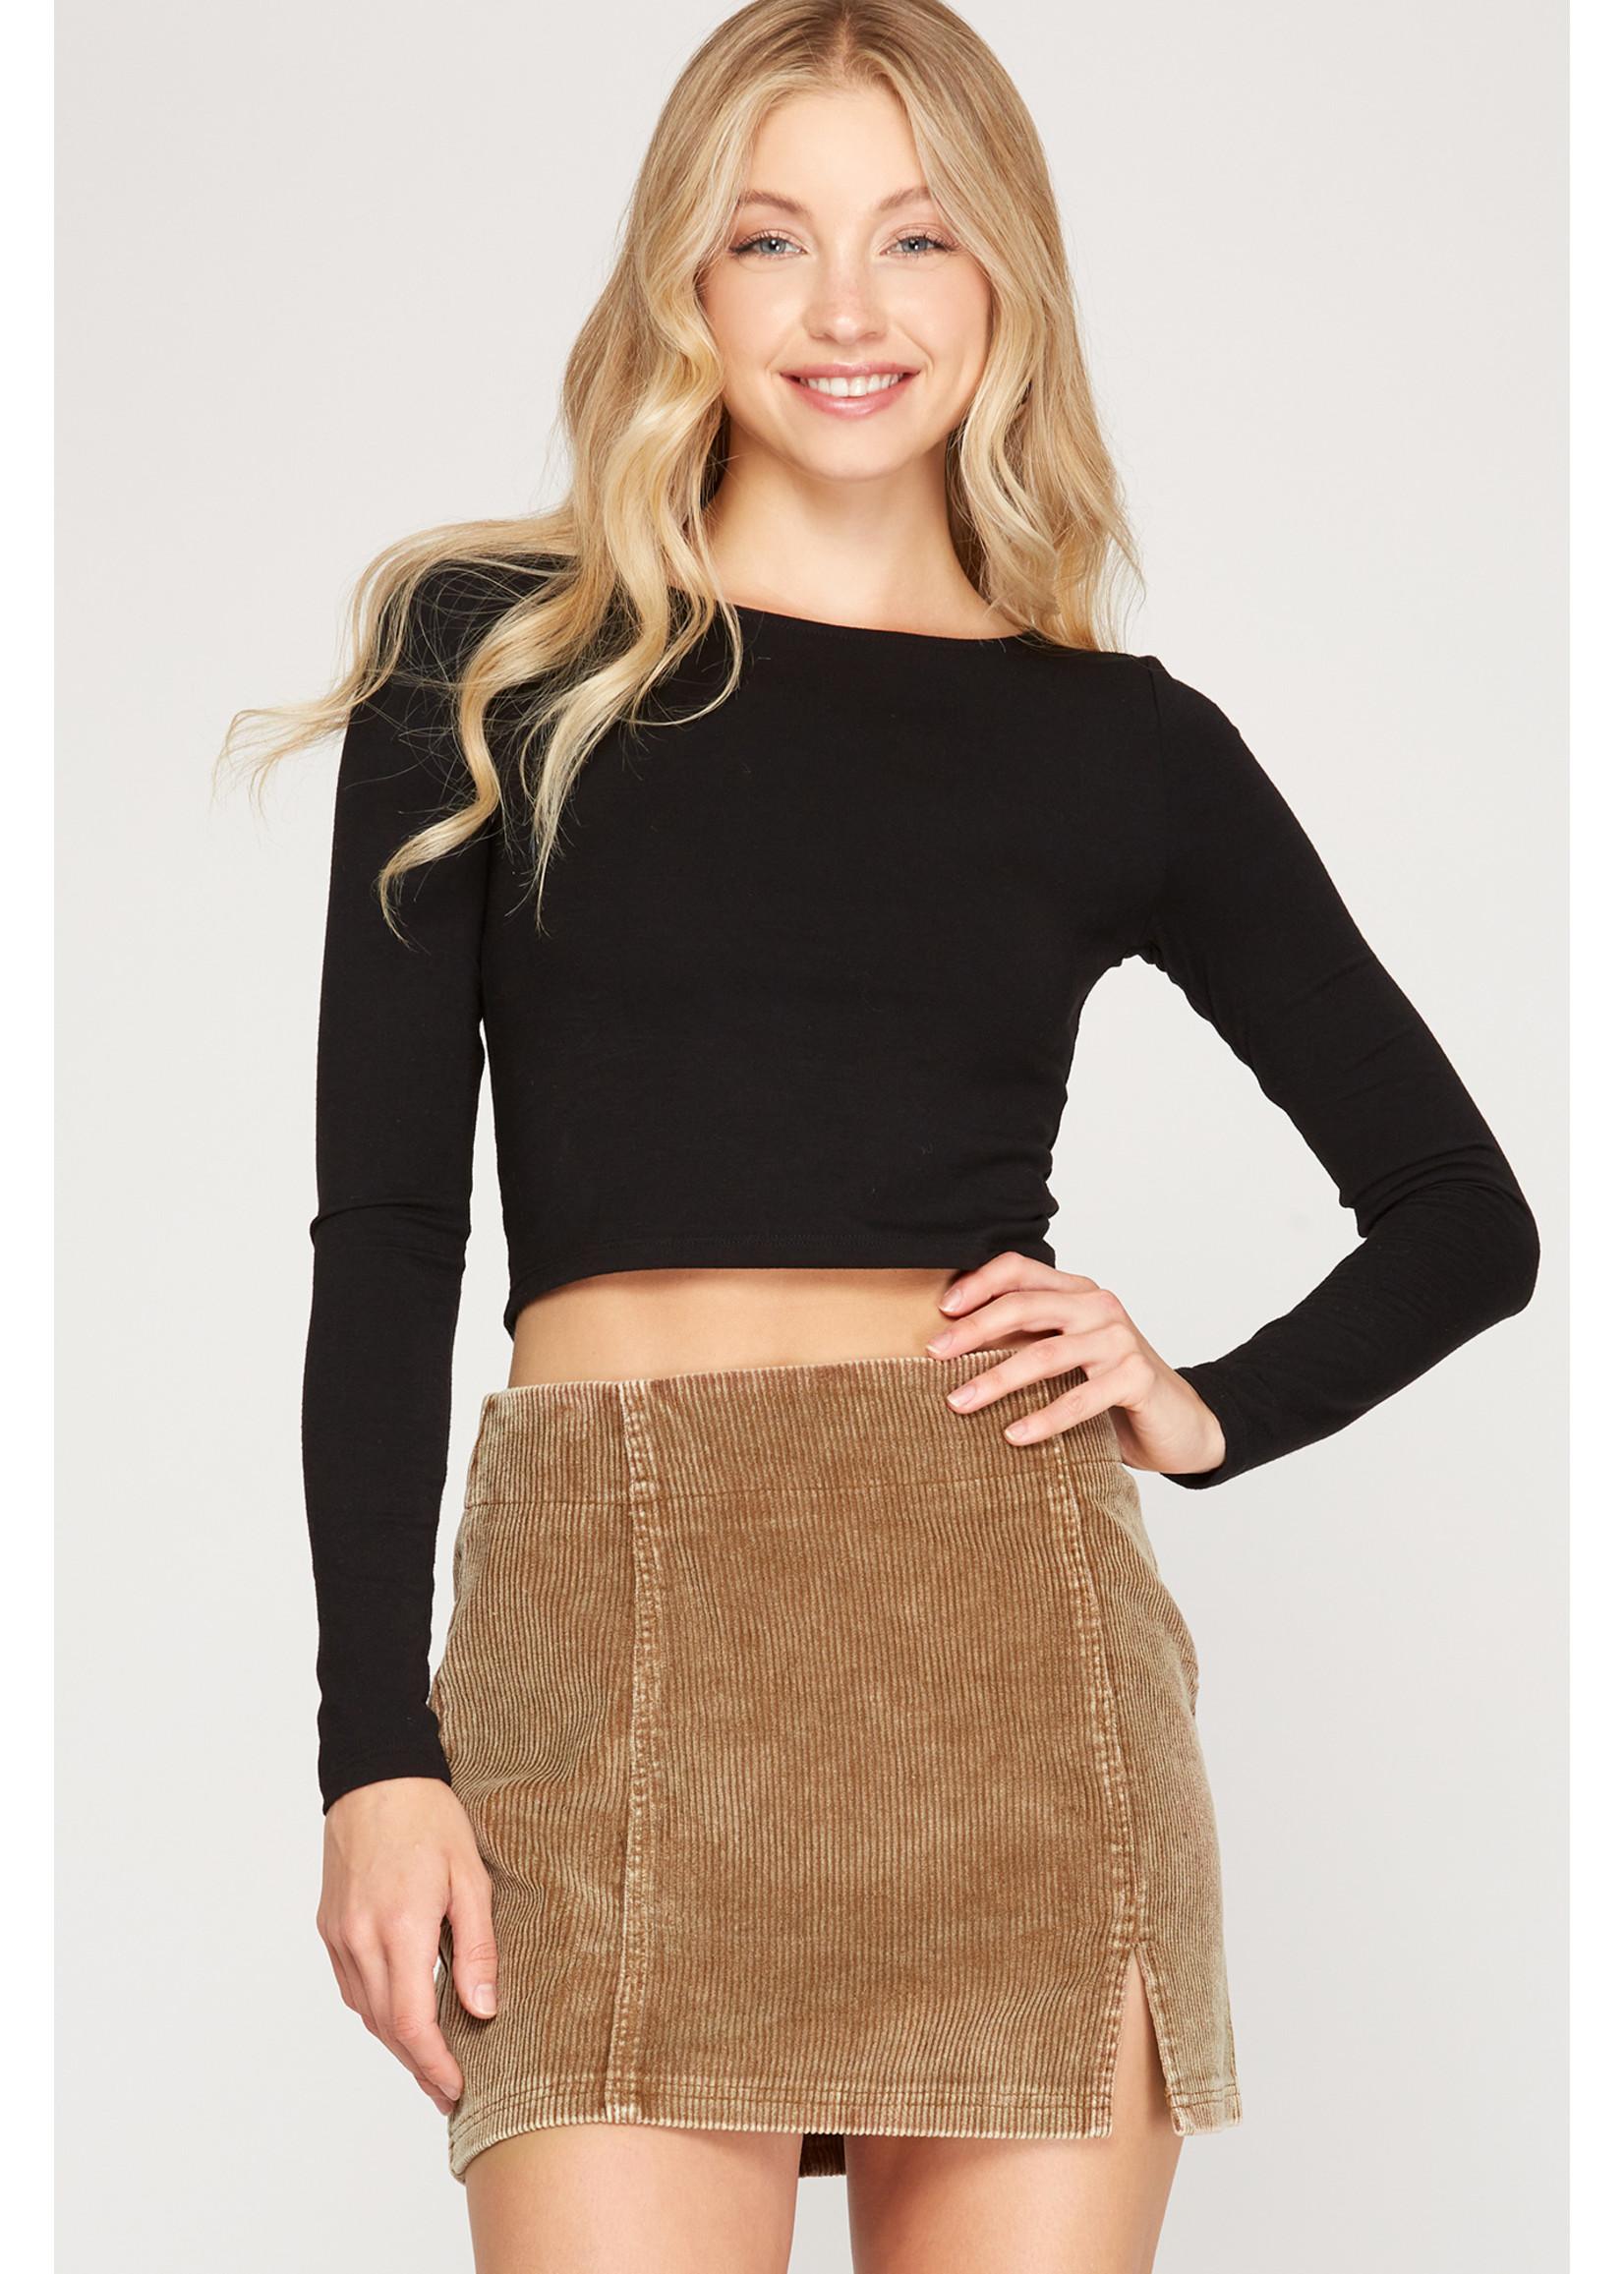 She & Sky Corduroy Skirt